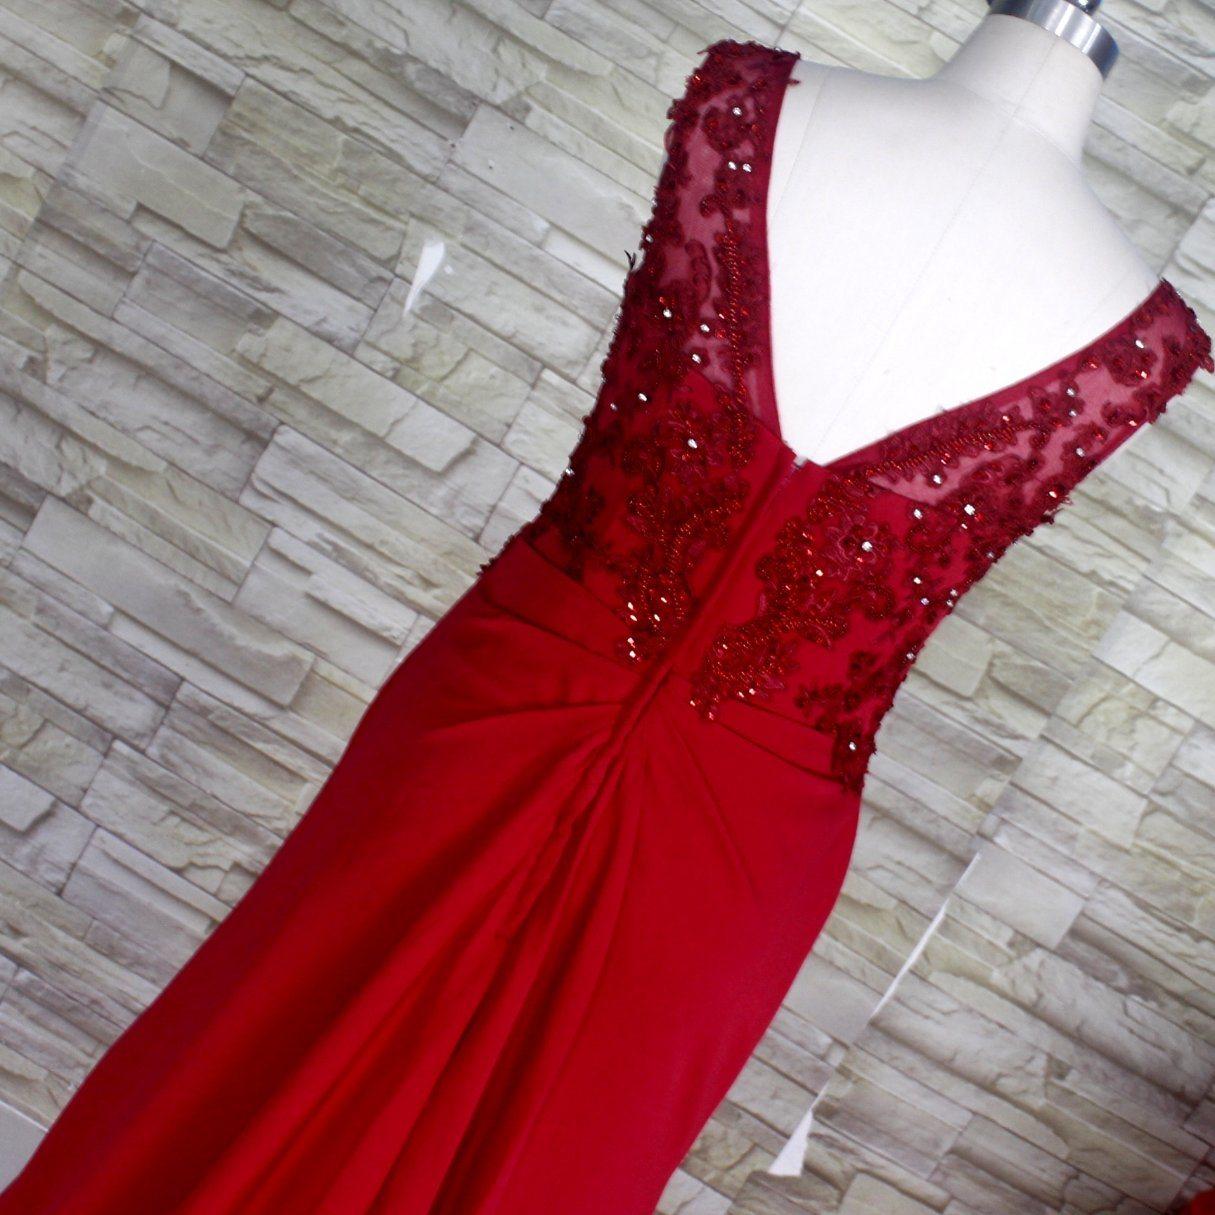 Wine Evening Dress Rhinestones Stretch Jesery Spandex Bridal Party Prom Gown E52718